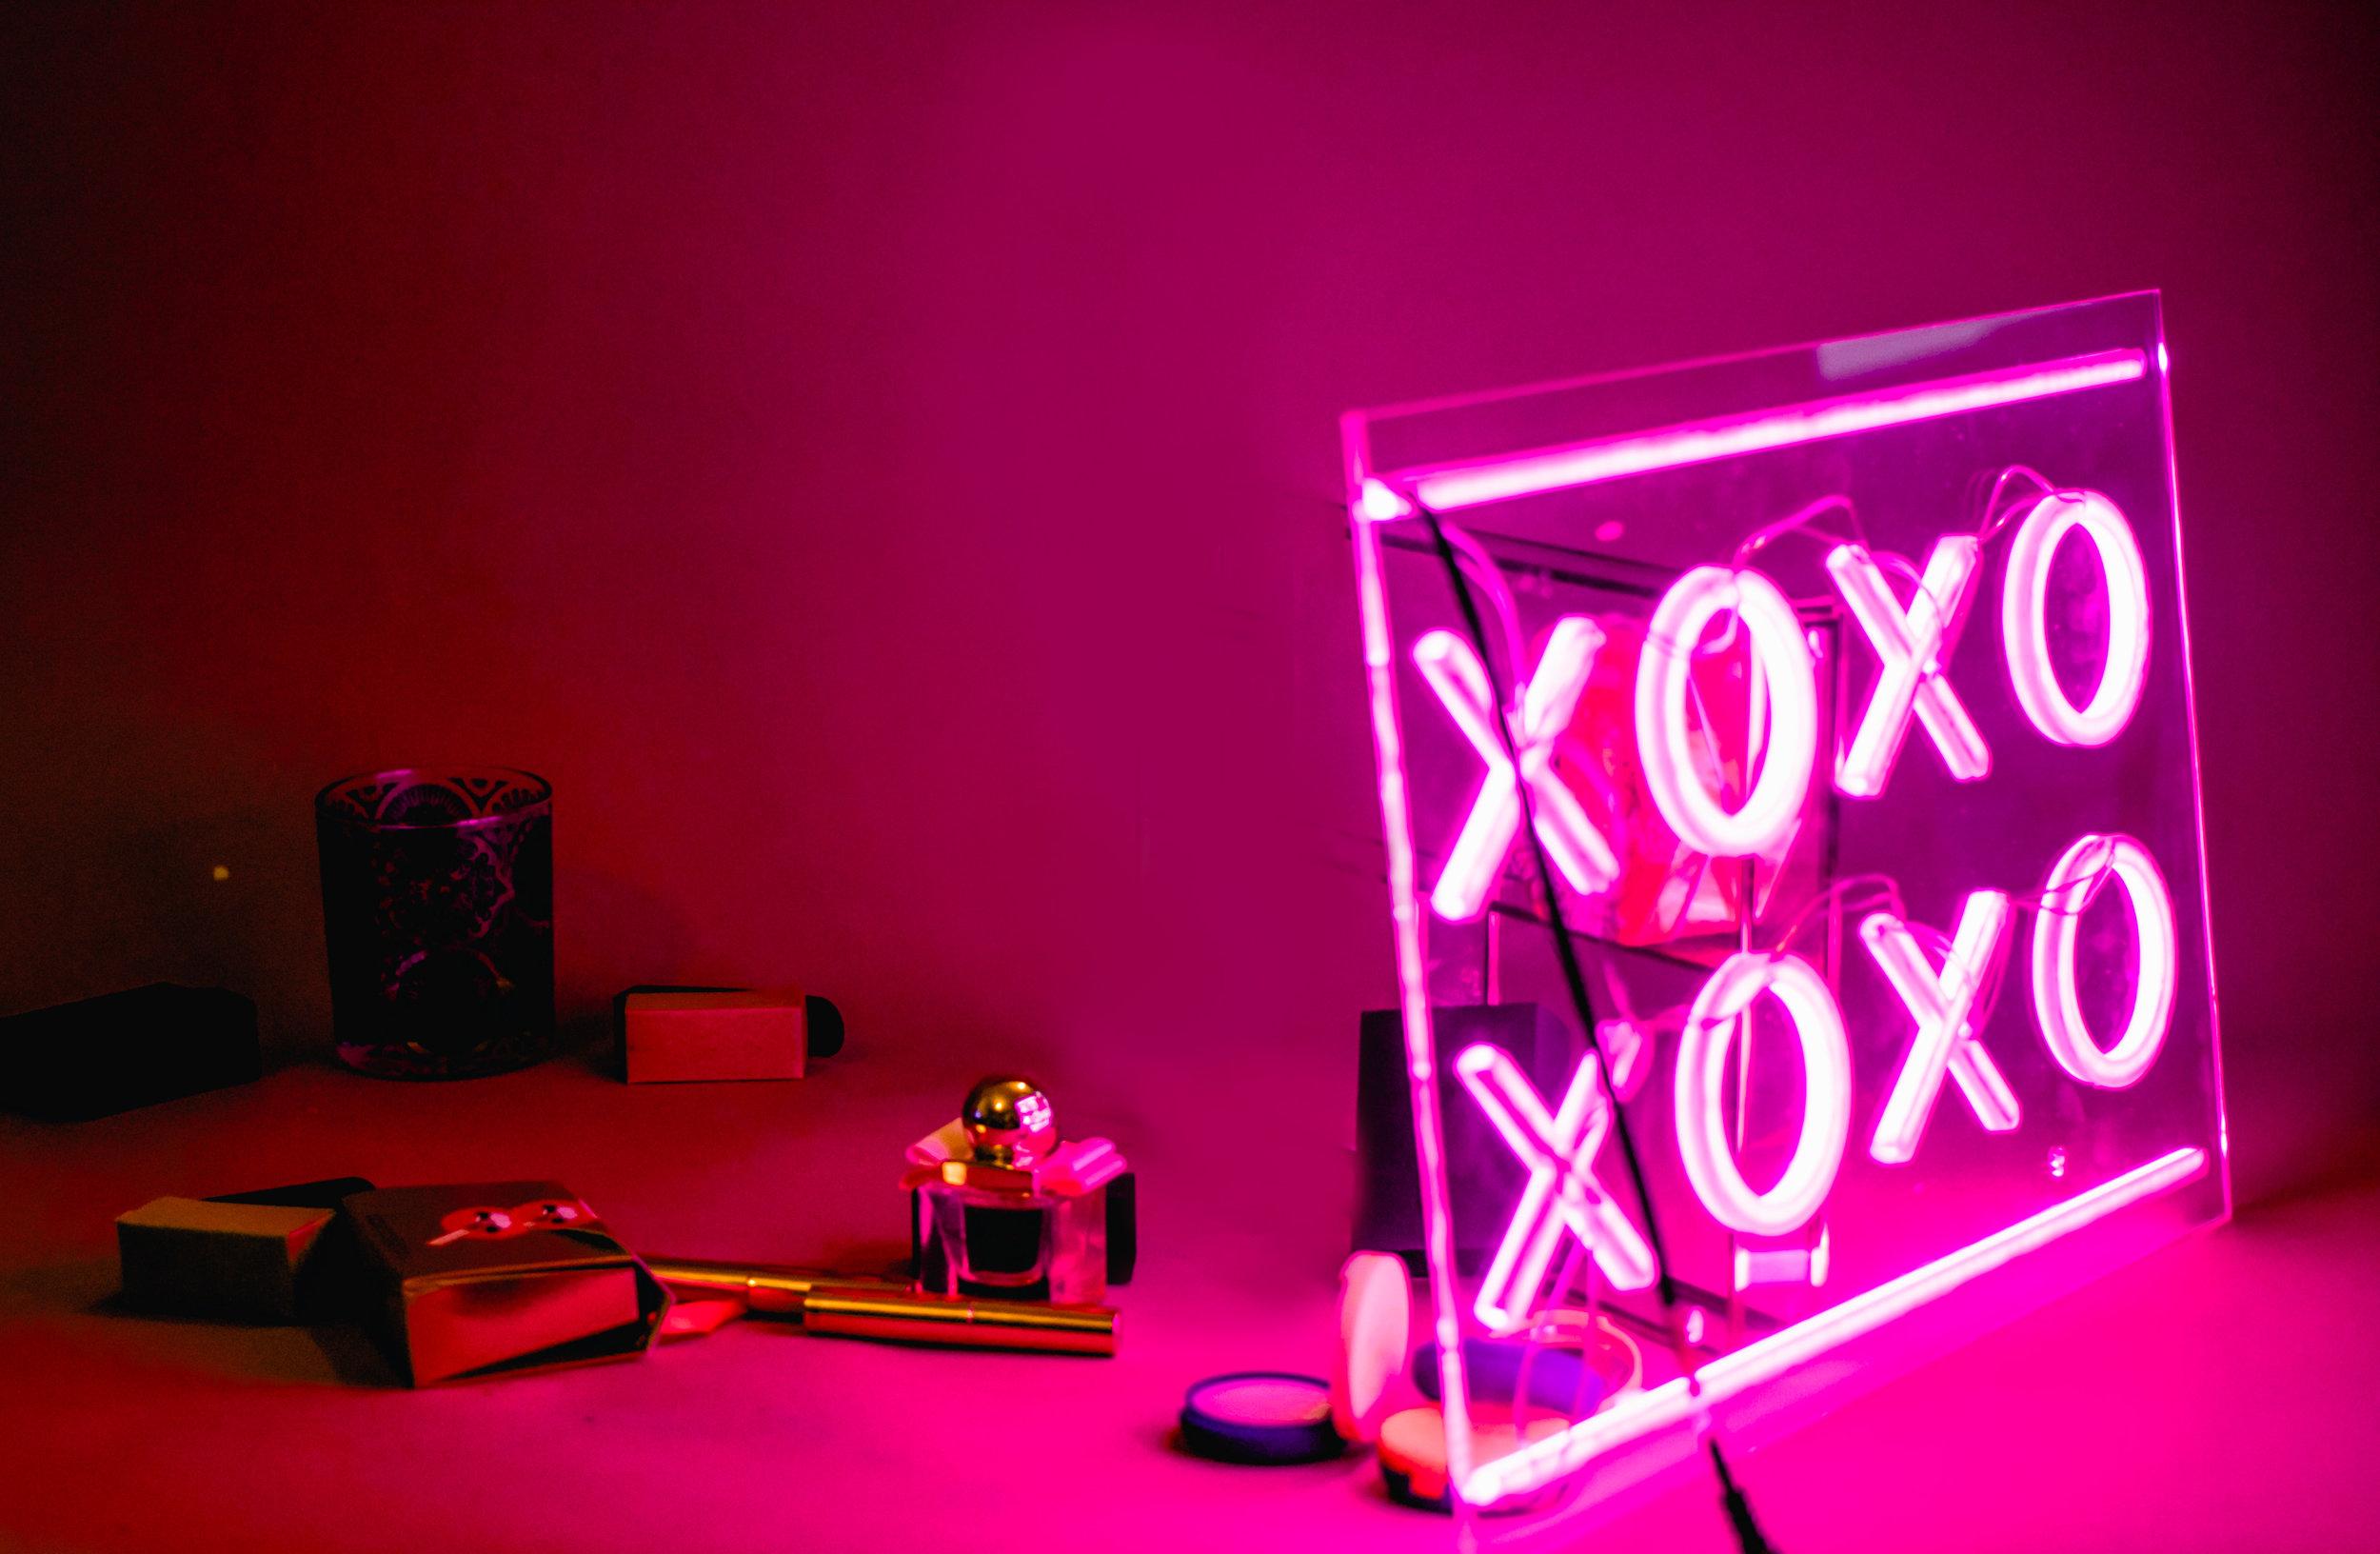 - Charlotte Tilbury- Mini Hollywood lipstick charmsBurts Bees - Bounty TrioFerragamo - SignorinaLypsyl - Mirror compactsLush- Slapstick foundation // Glow stick